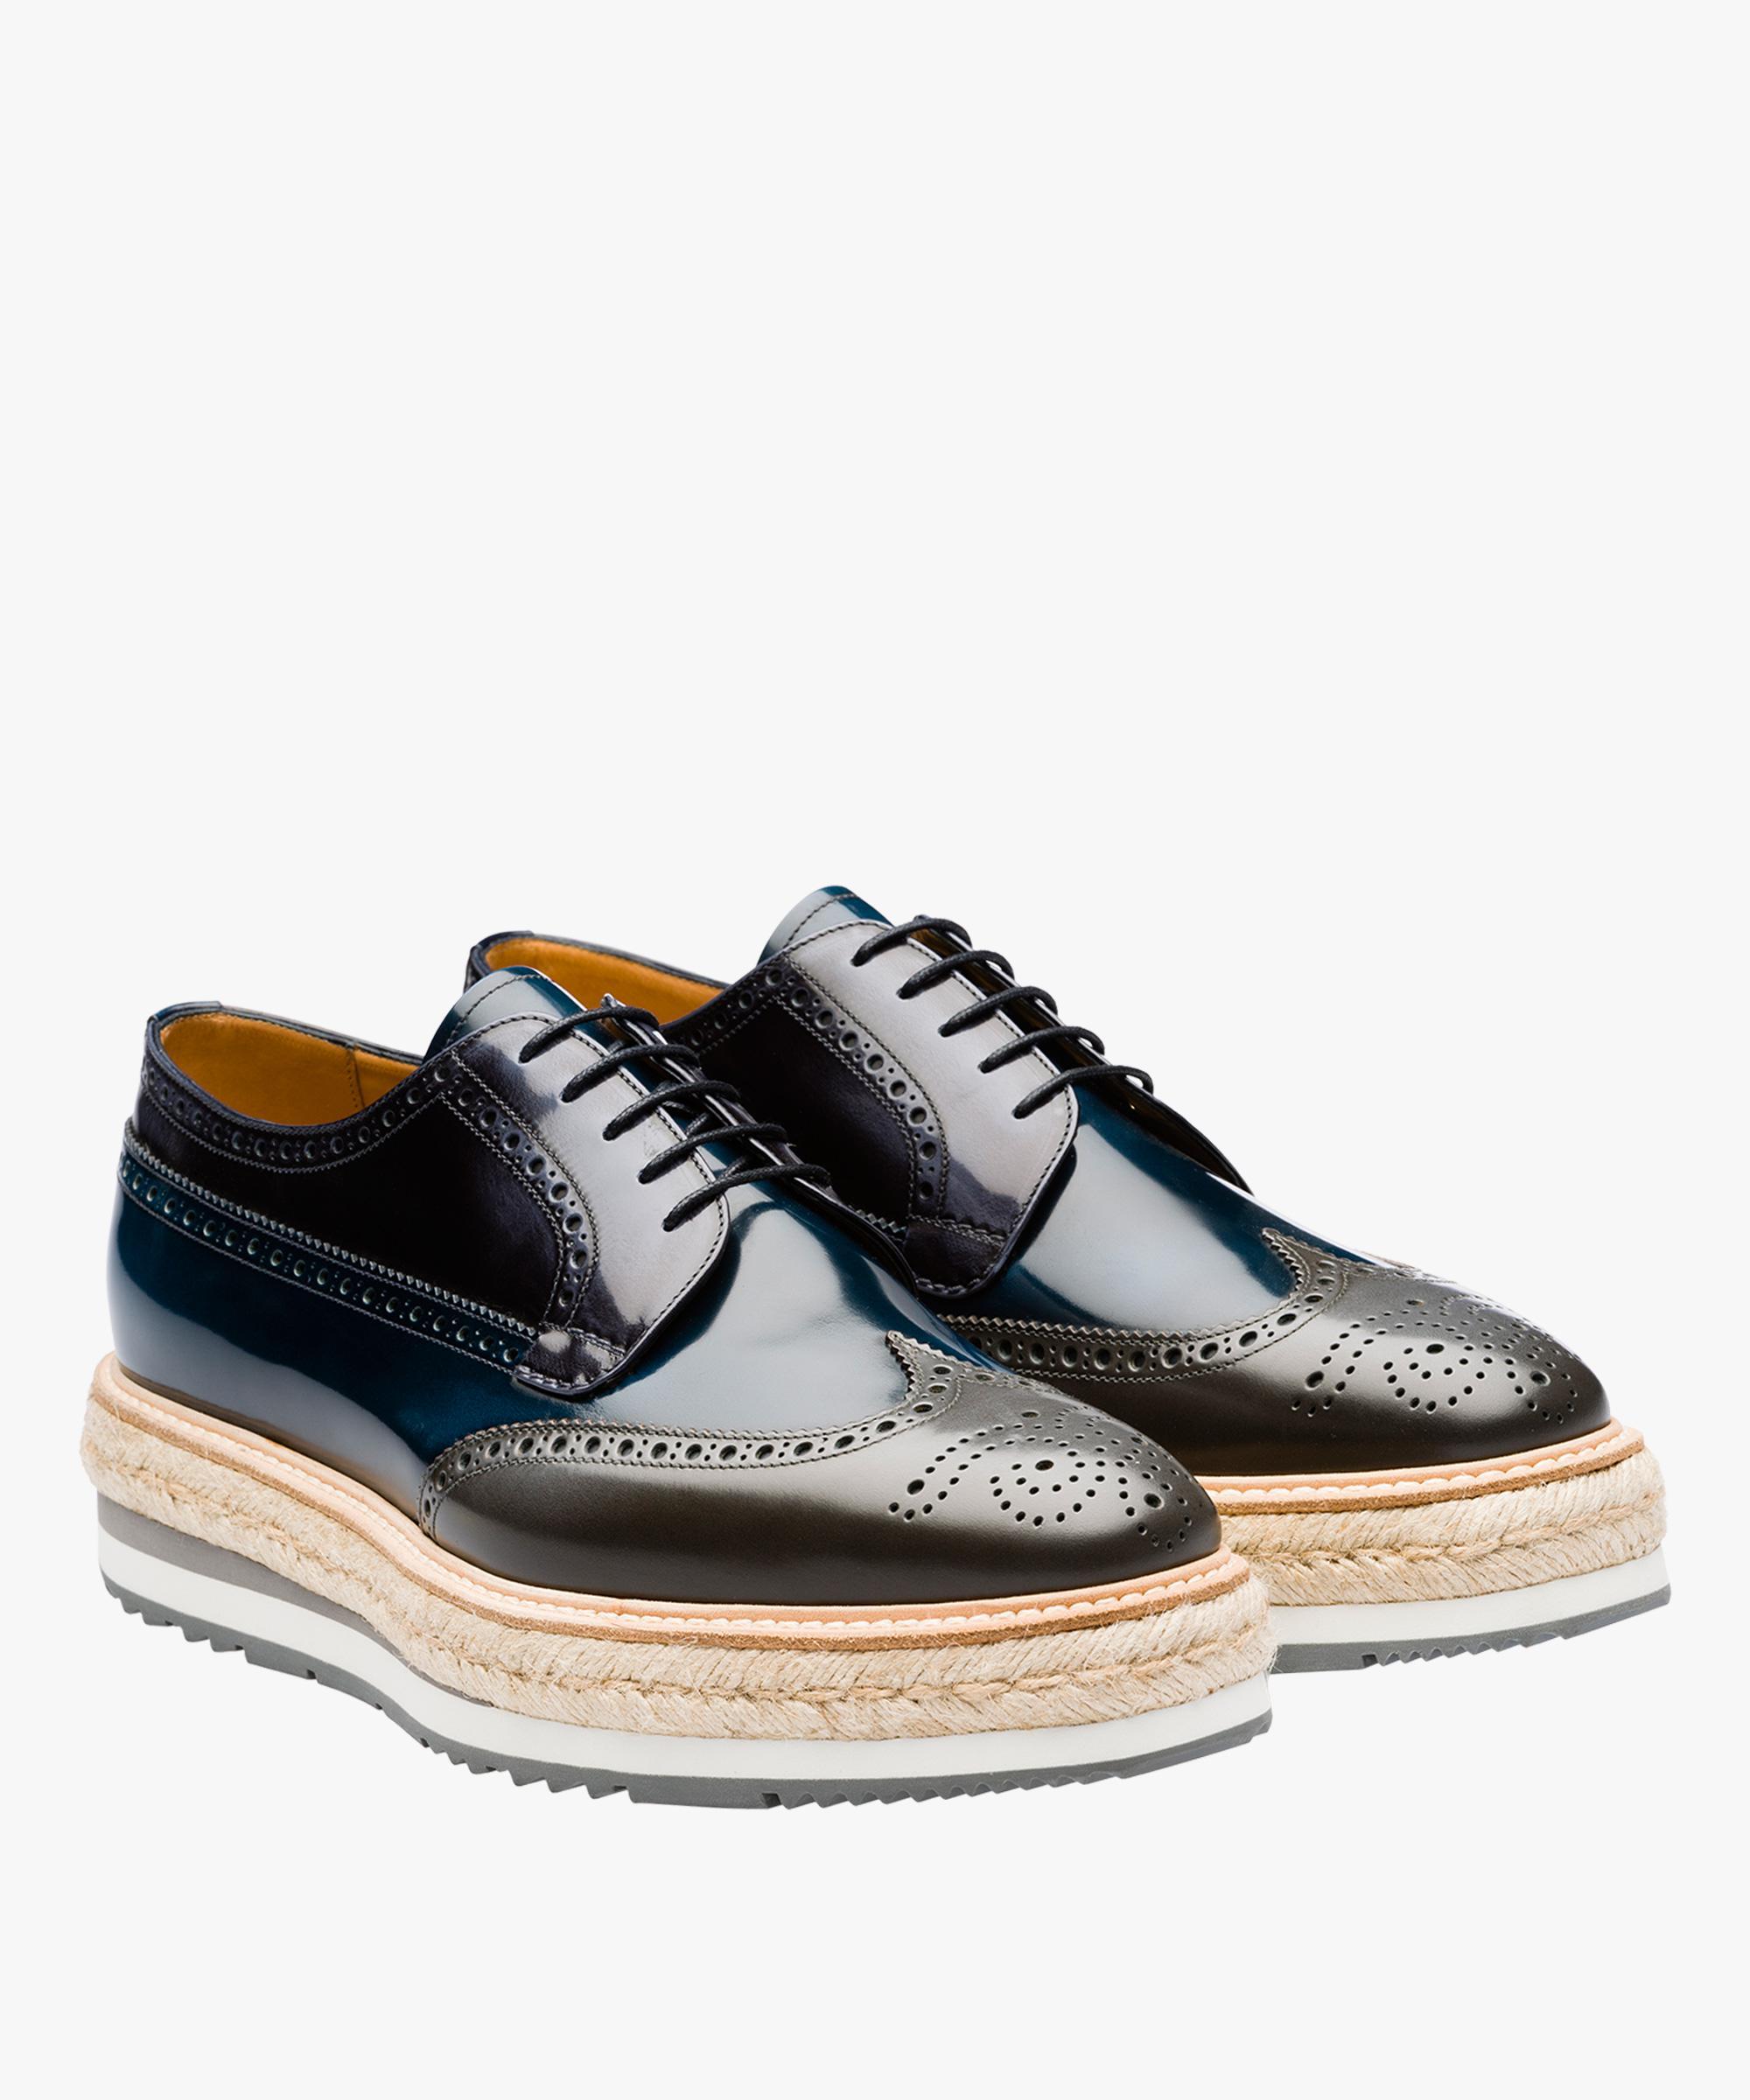 cff67f6ffe Lyst - Prada Leather Platform Derby Shoes in Blue for Men